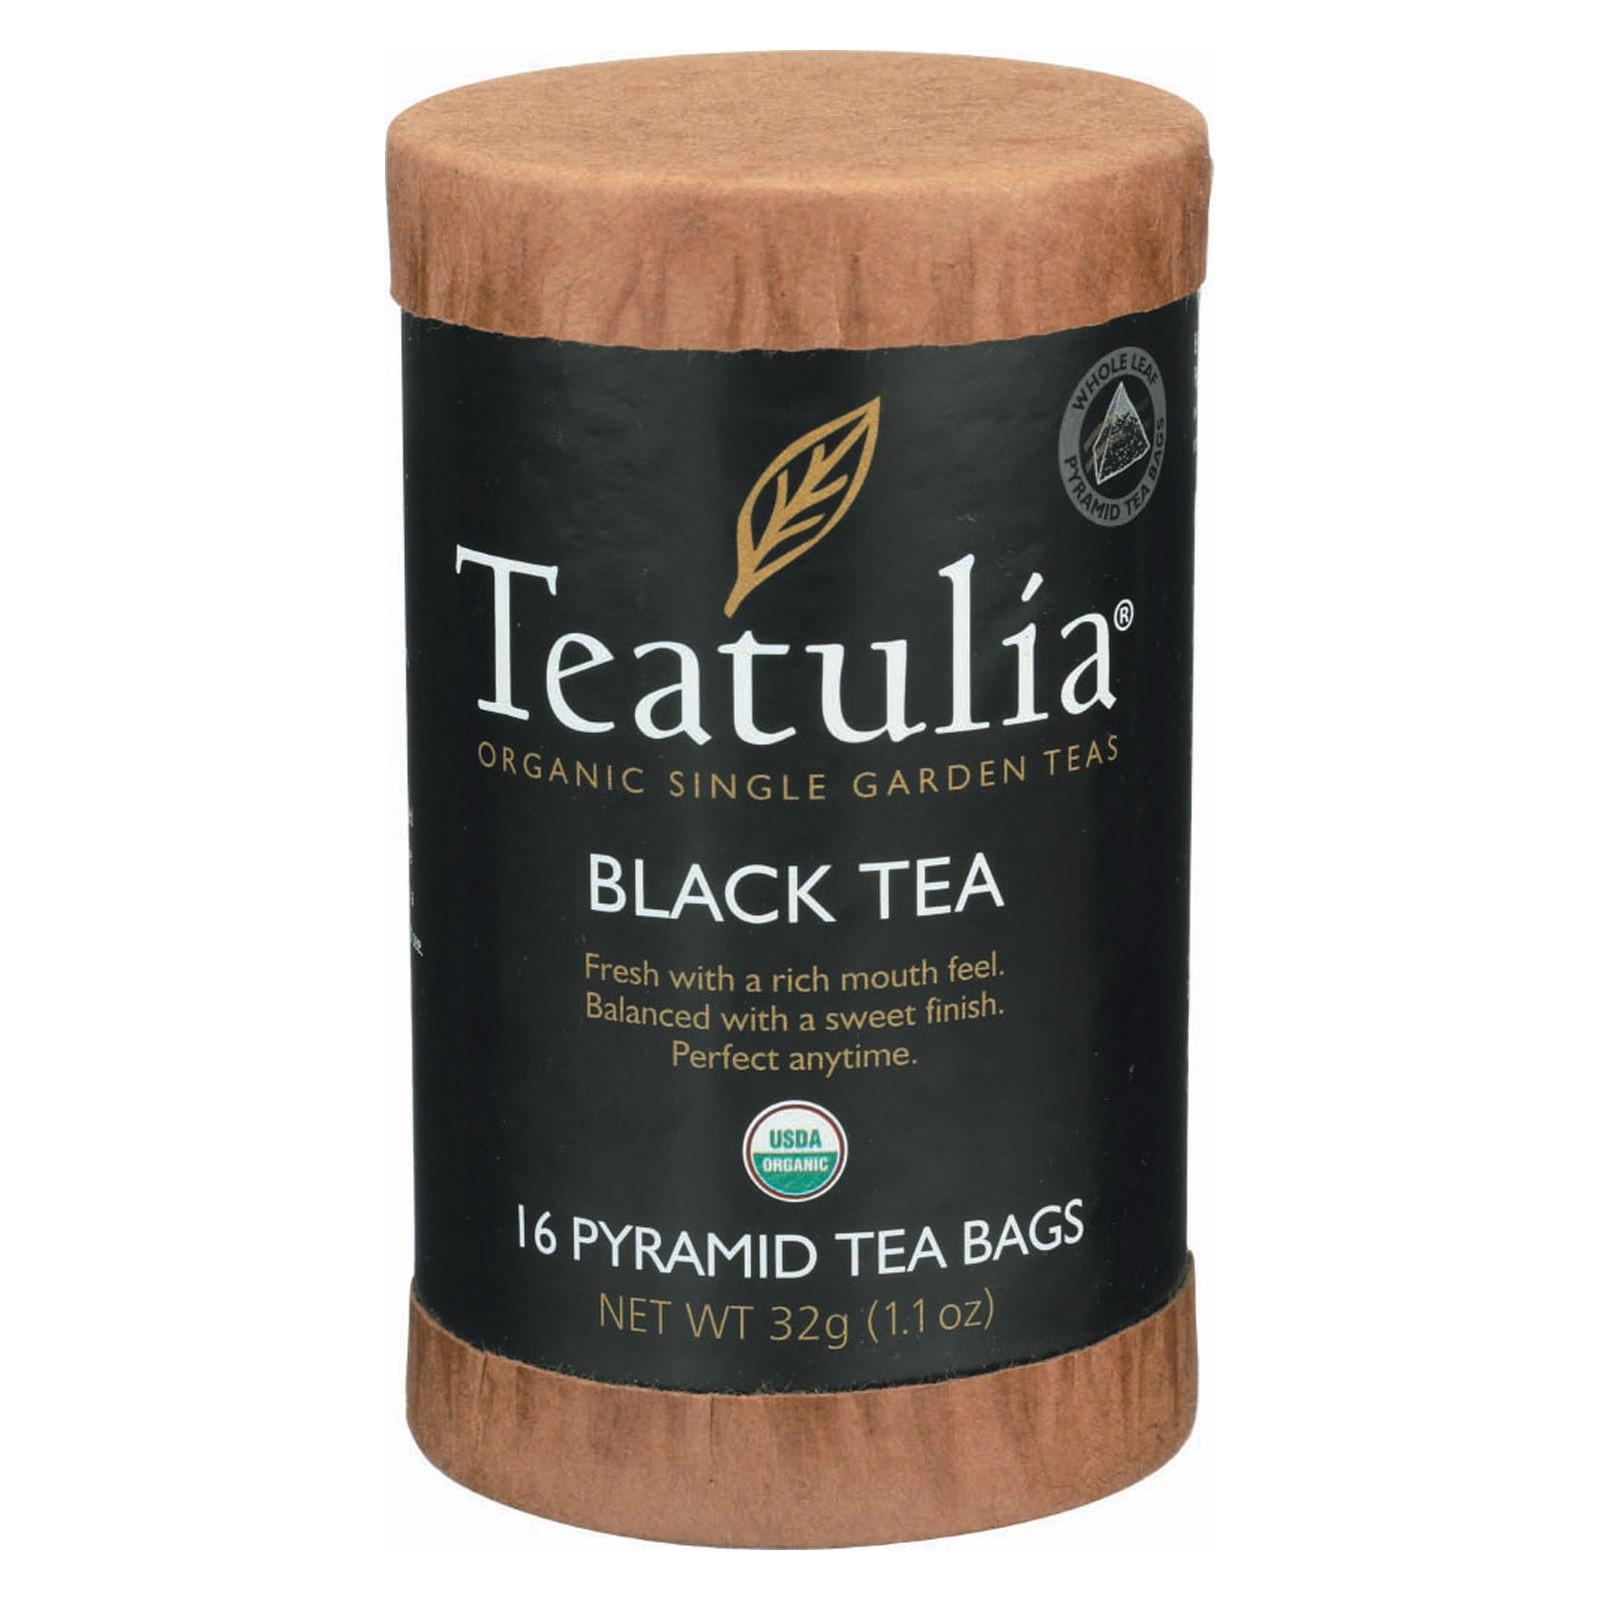 Teatulia Organic Teatulia Black Tea - Case of 6 - 16 BAG